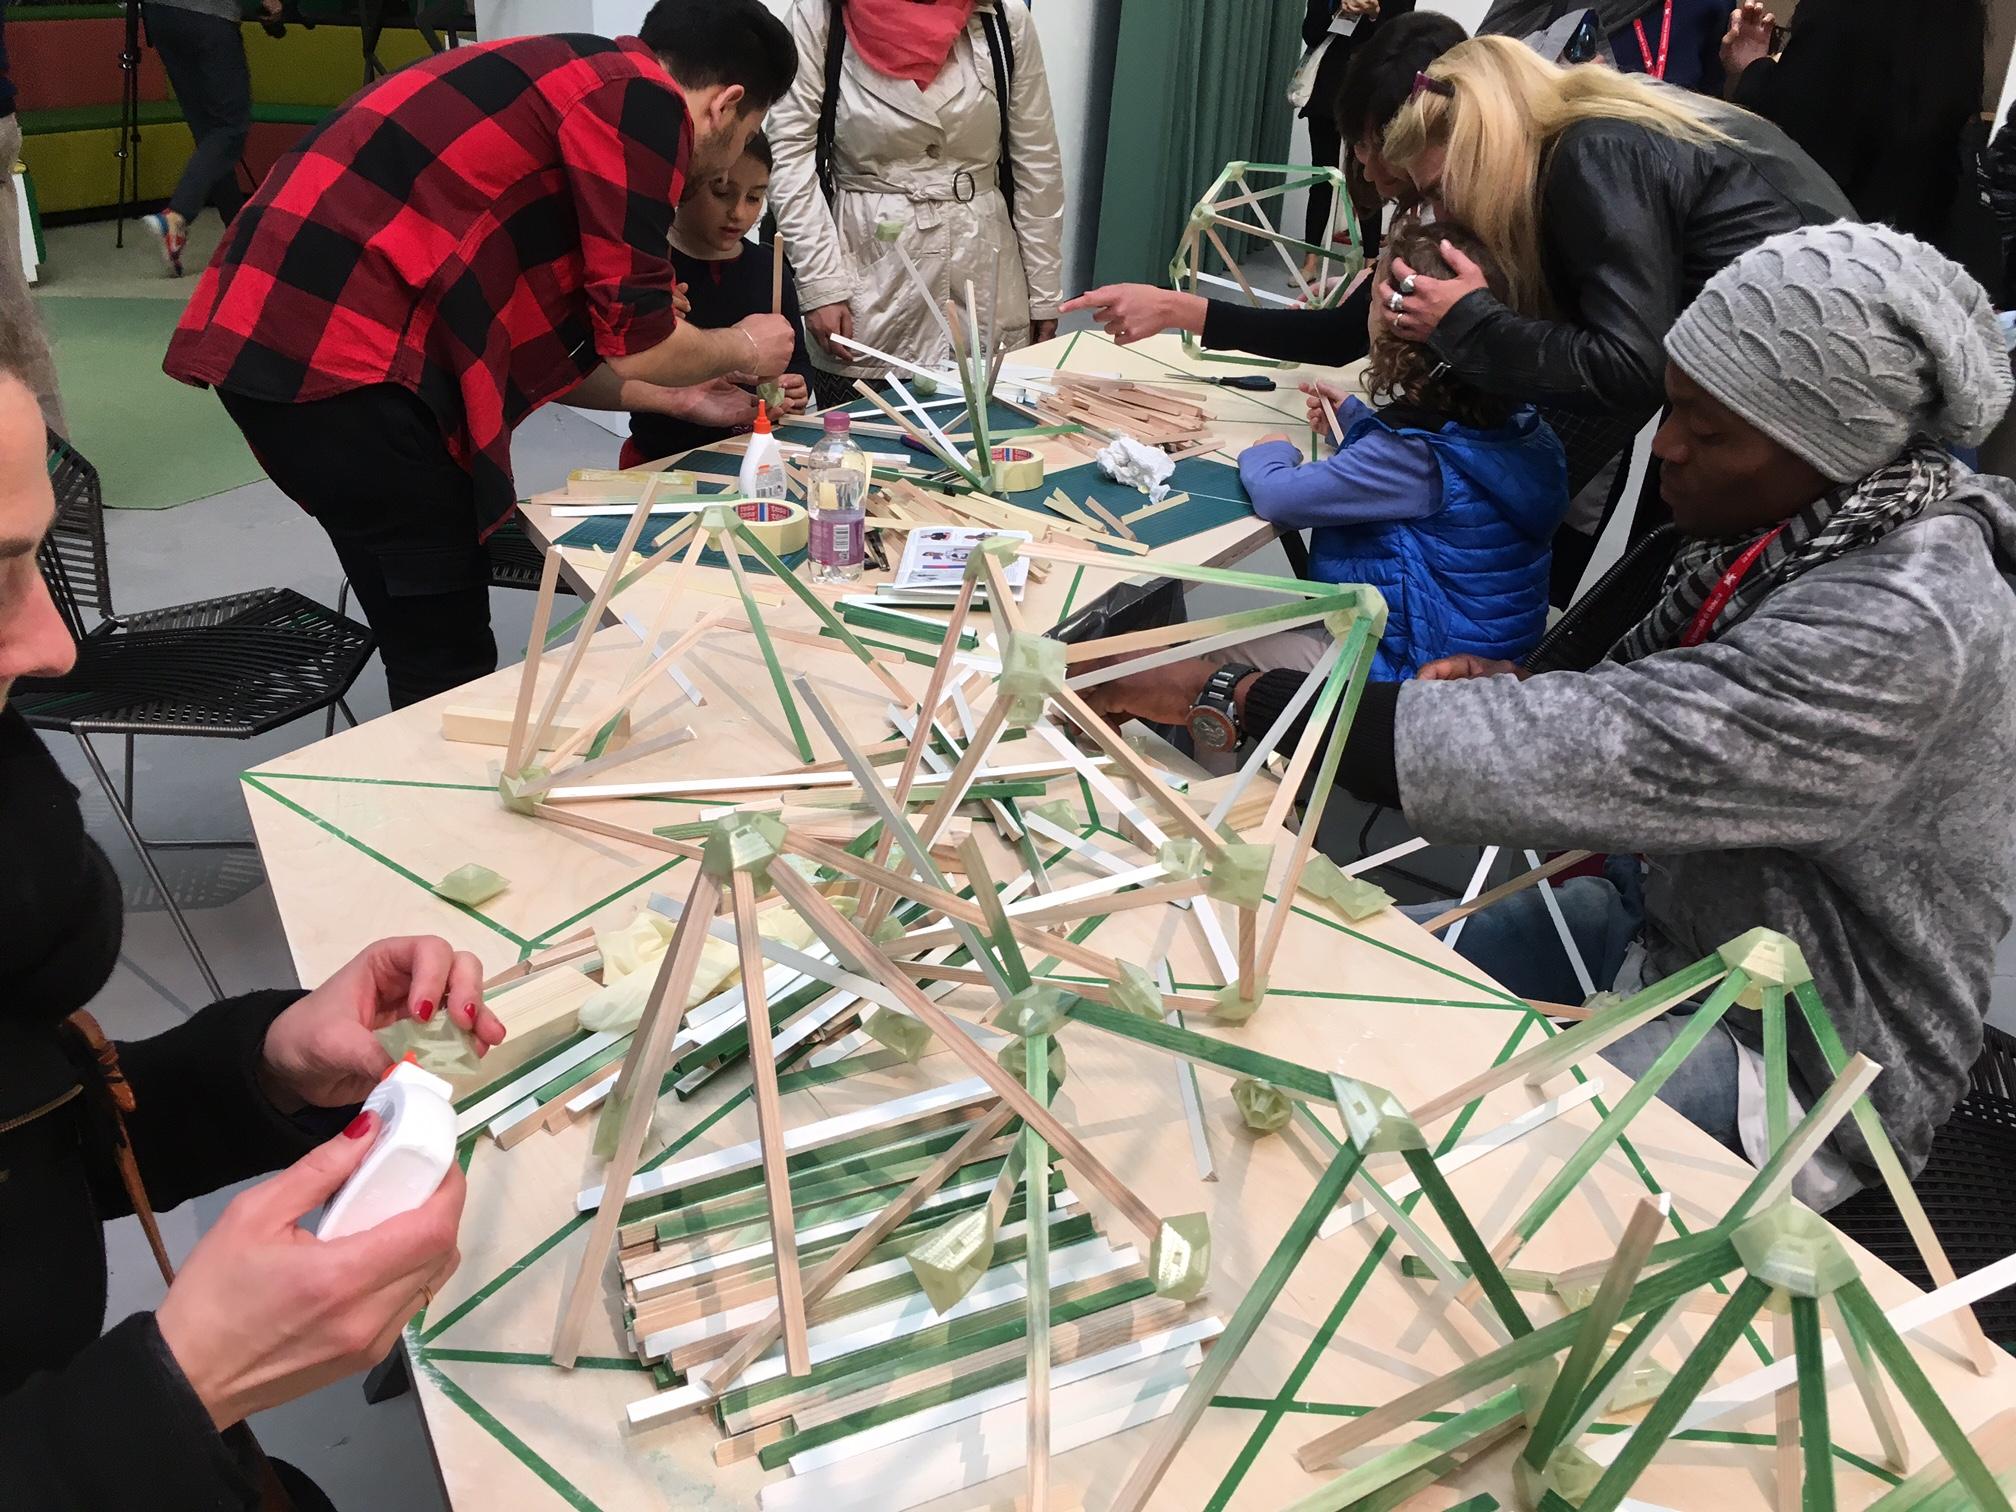 green-light-project-olafur-eliasson-biennale-venise